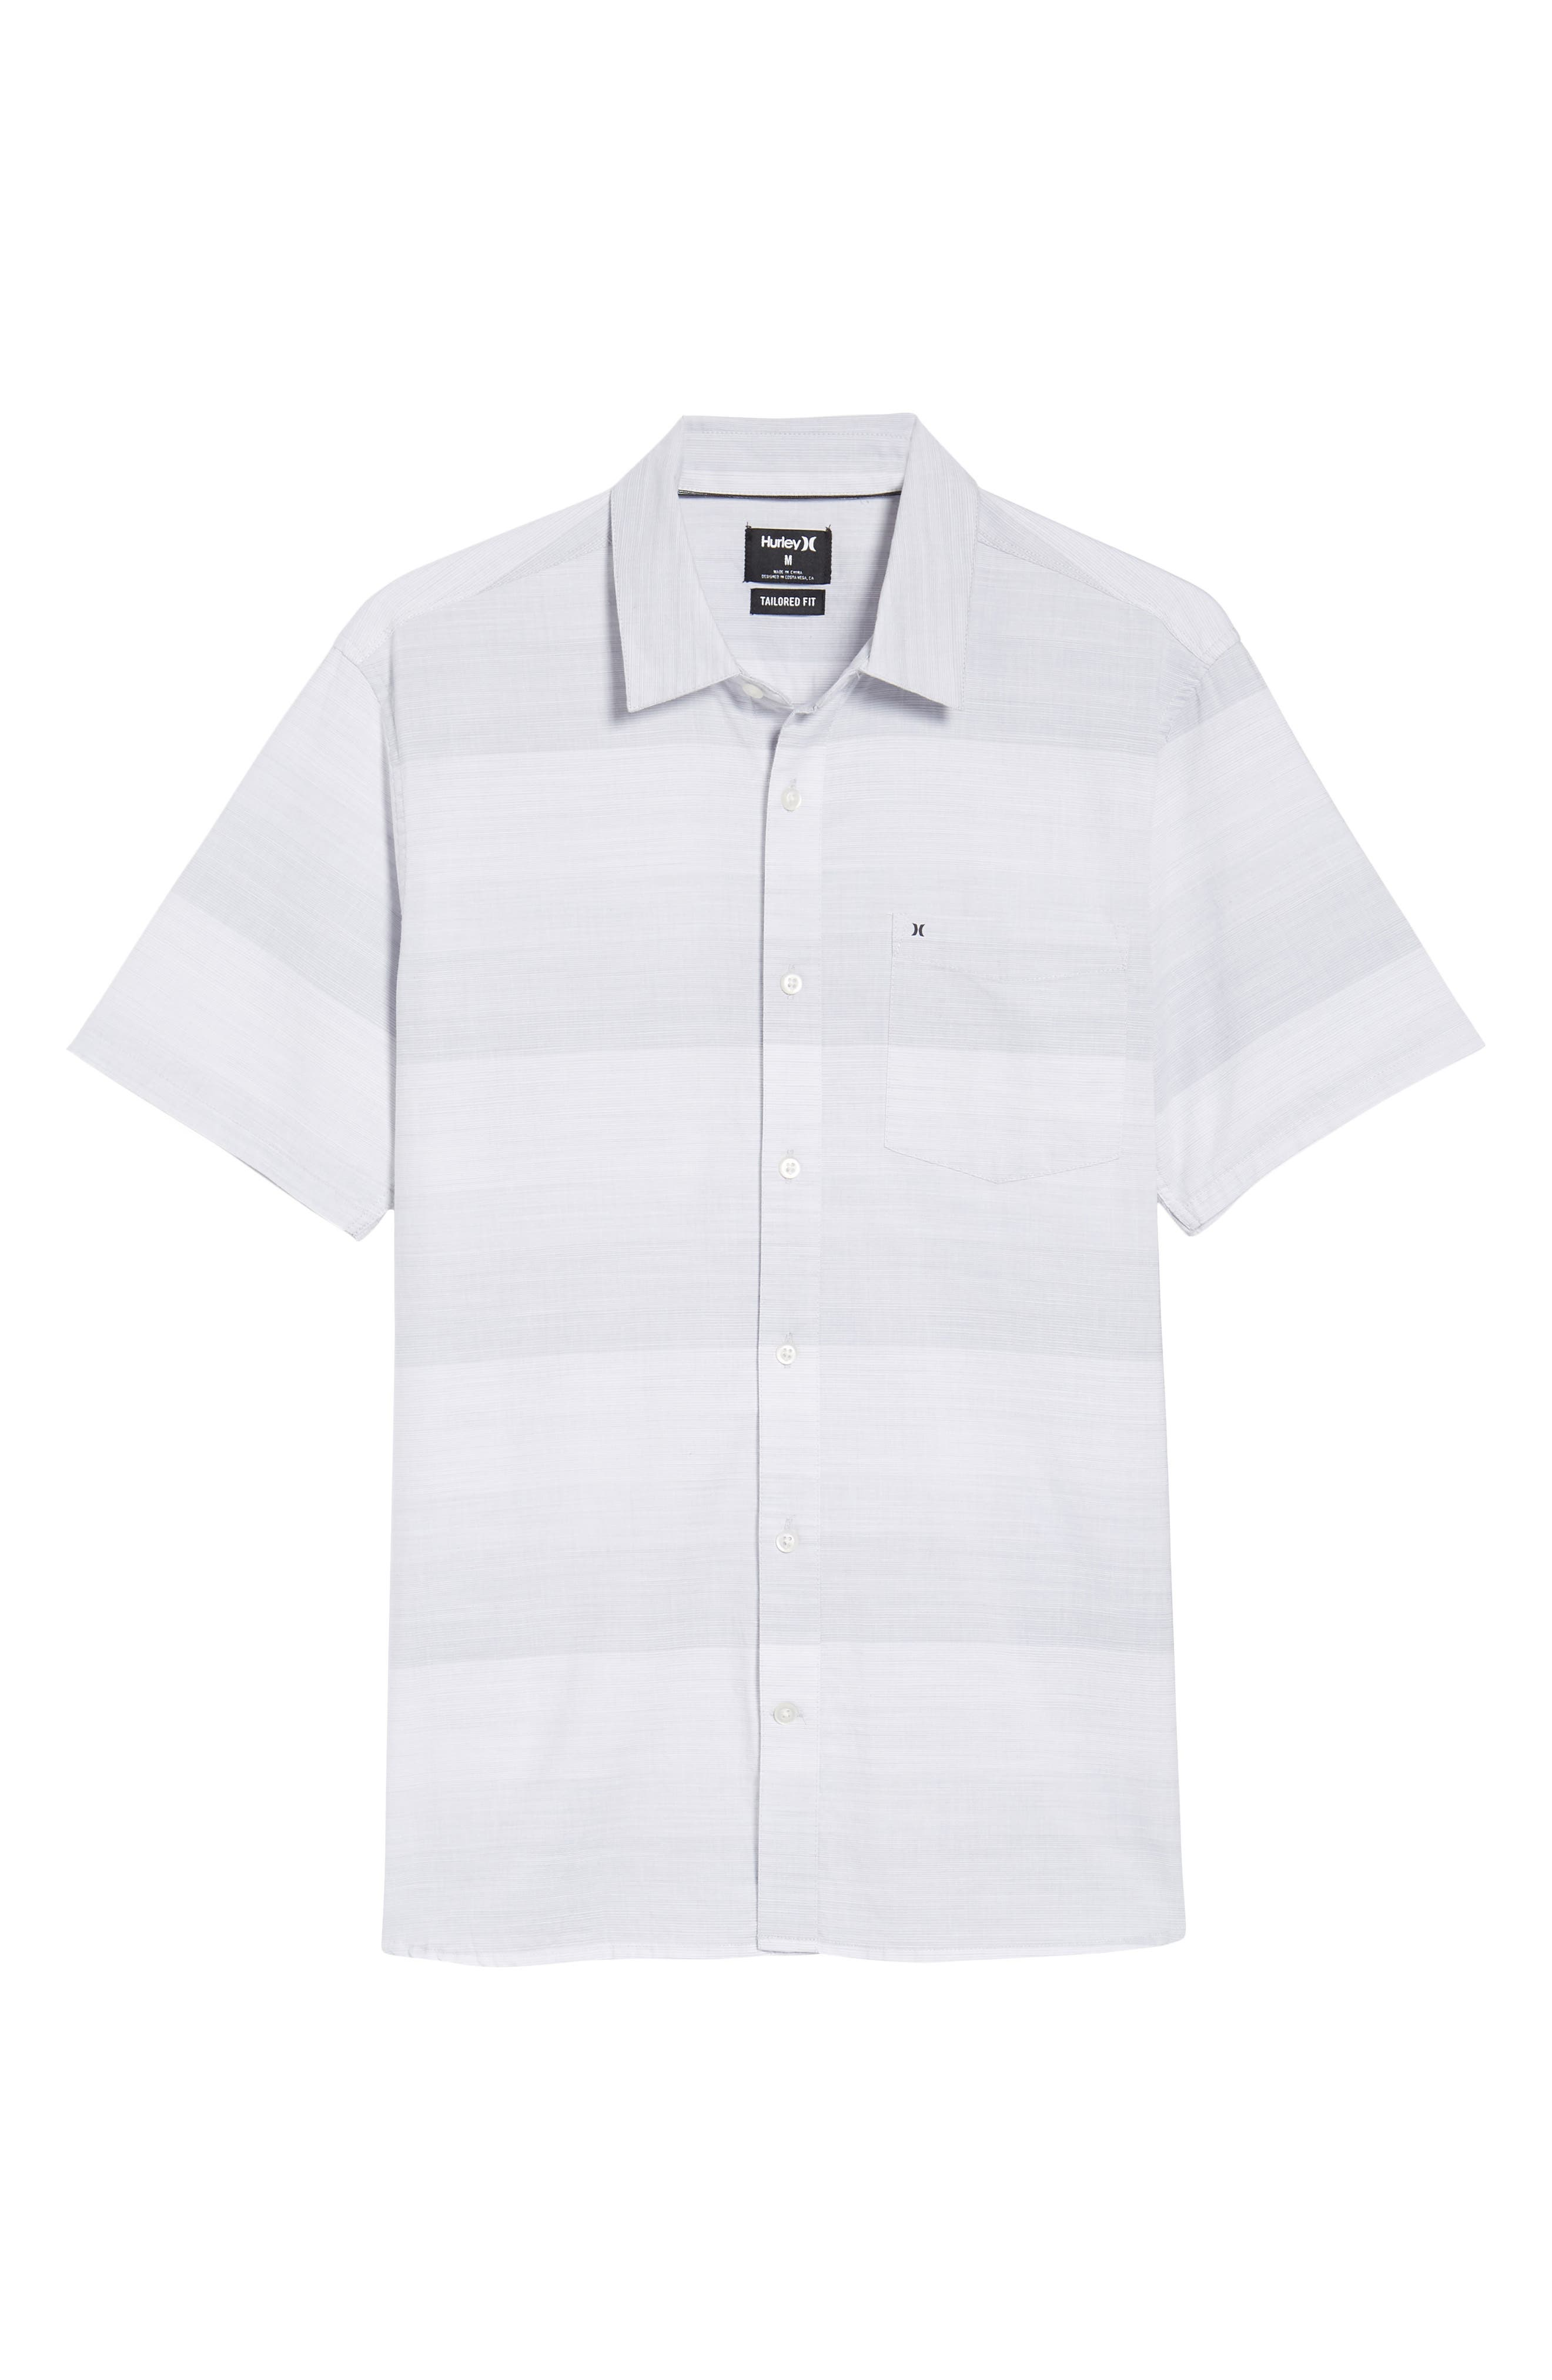 Morris Shirt,                             Alternate thumbnail 6, color,                             WOLF GREY